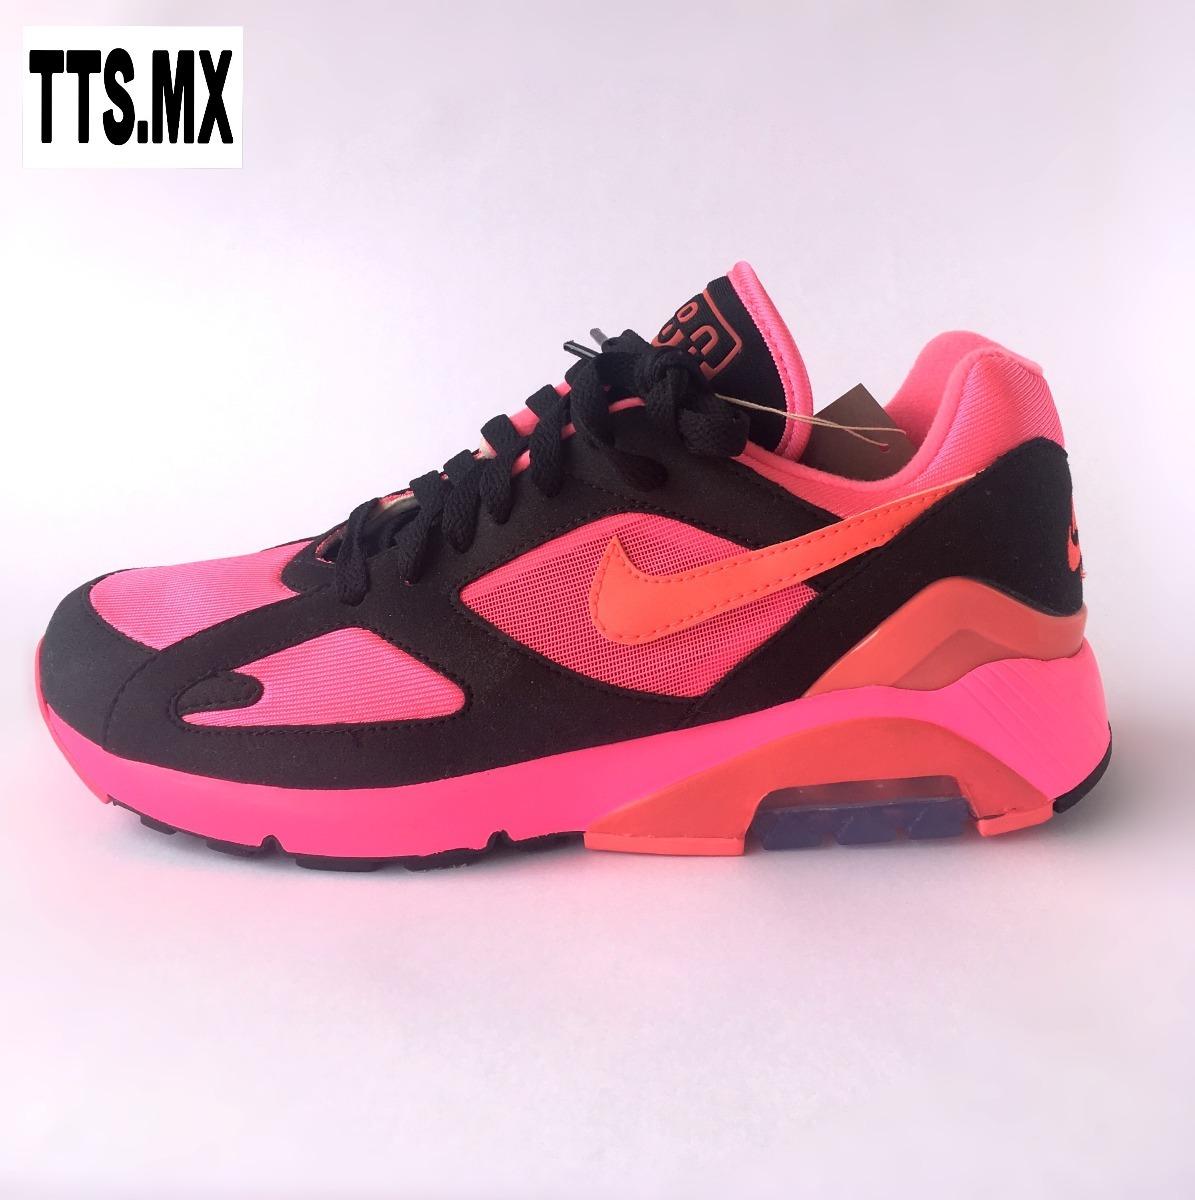 ... shop tenis nike air max 180 cdg comme des garcons 4.5mx tts.mx. 87e12116a964f